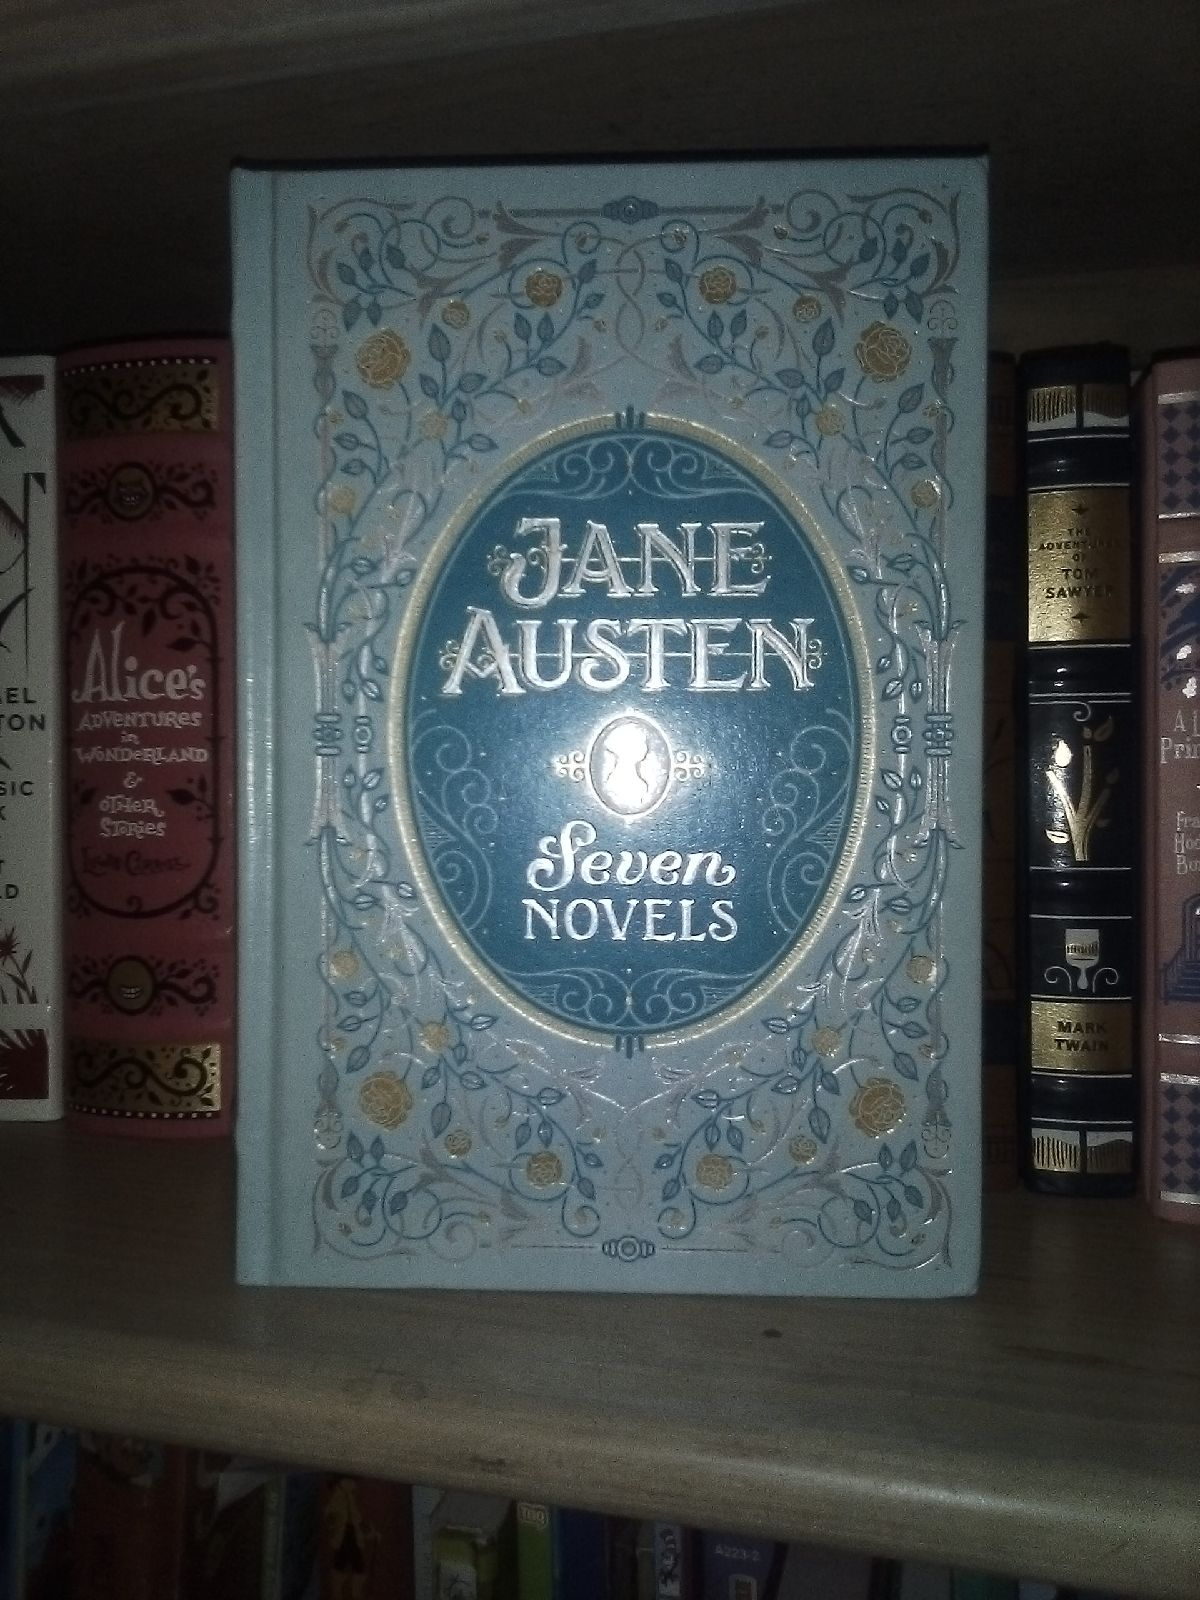 Jane Austen Seven Novels